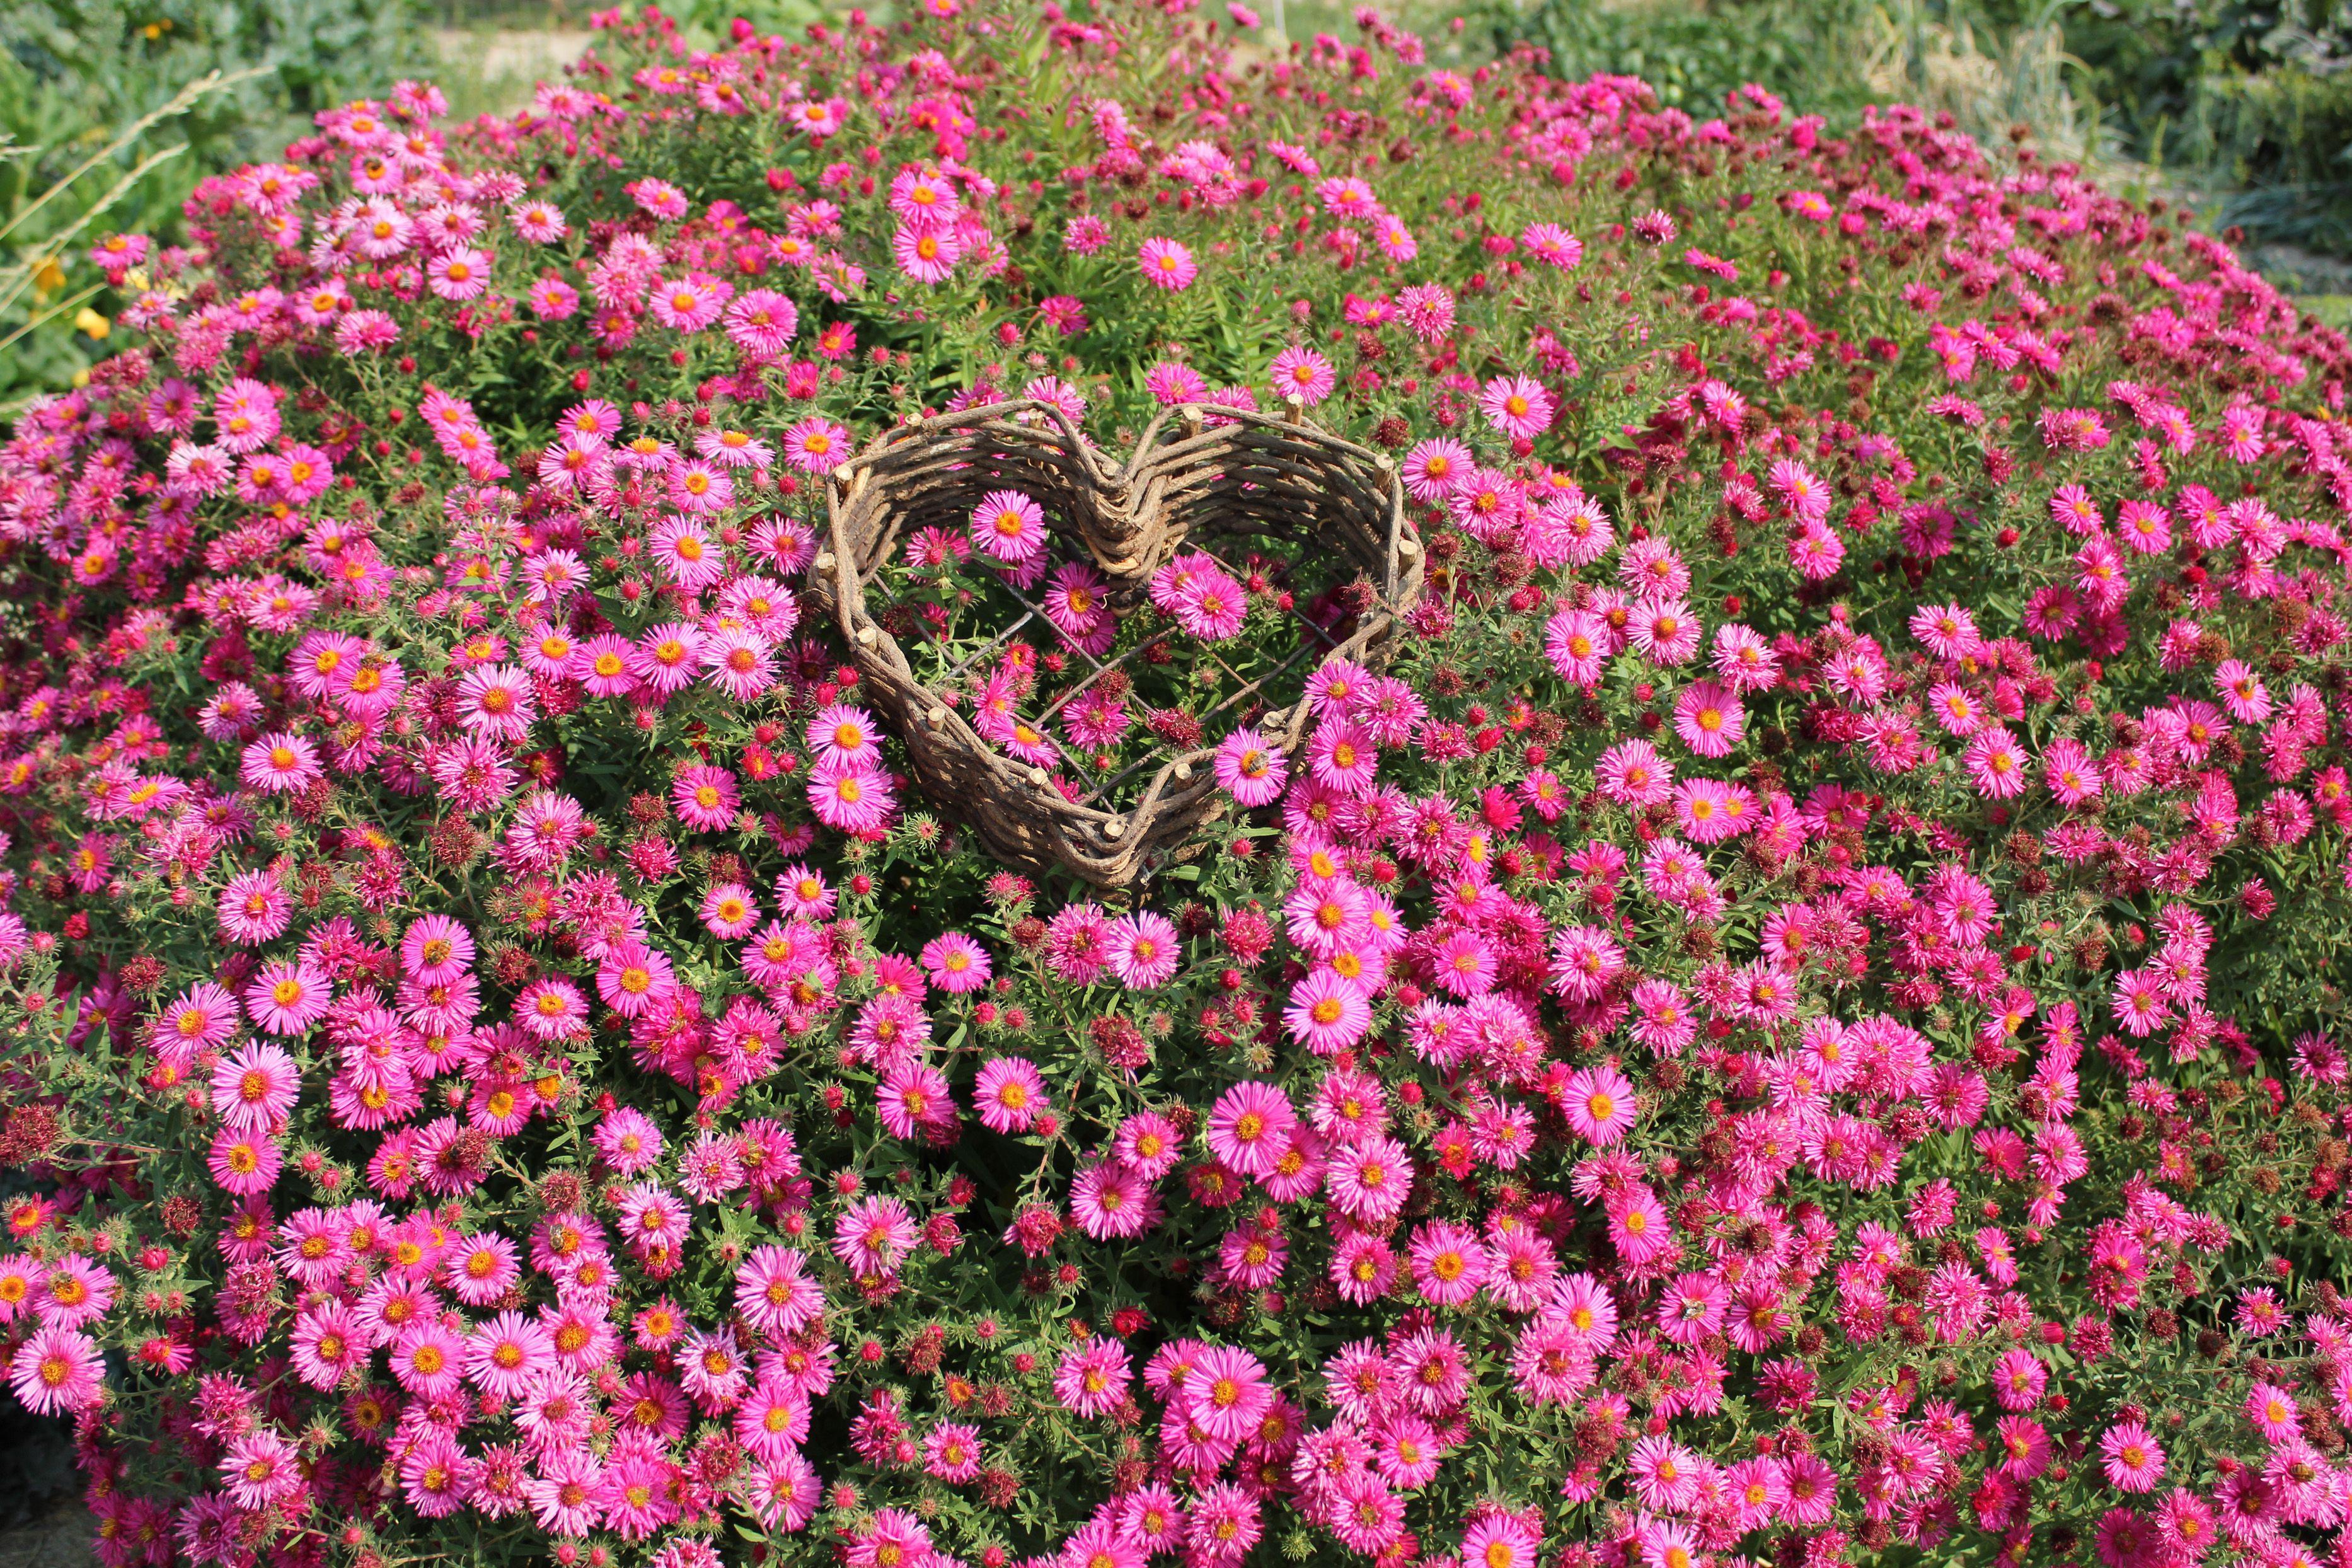 September Ruby Asterhardy Perennial Vibrant Deep Pink Flowers